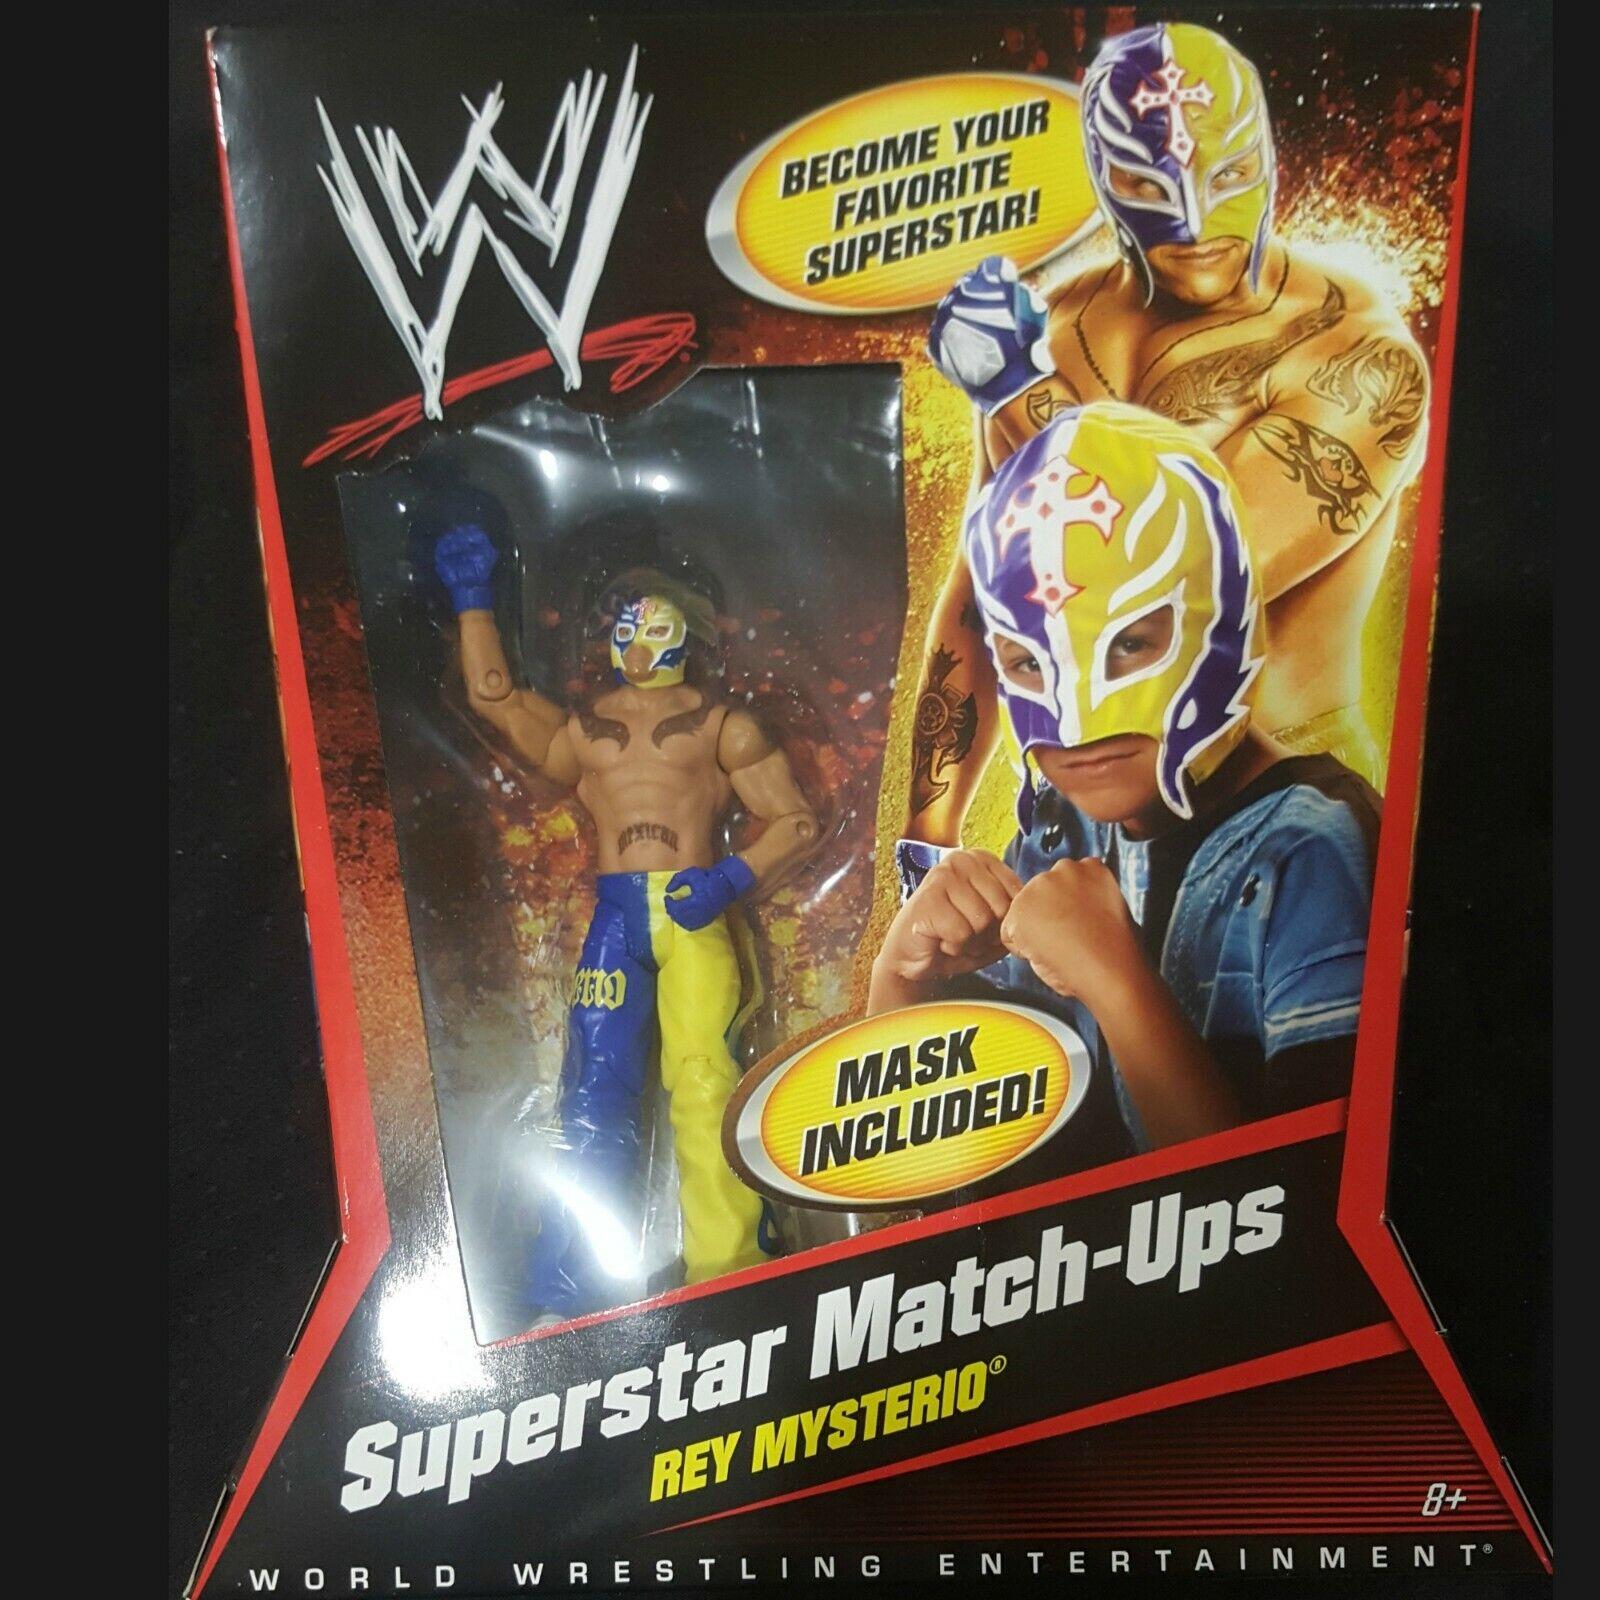 WWE ORIGINAL SUPERSTAR MATCH UPS - REY MYSTERIO BRAND NEW IN BOX 2010 w MASK